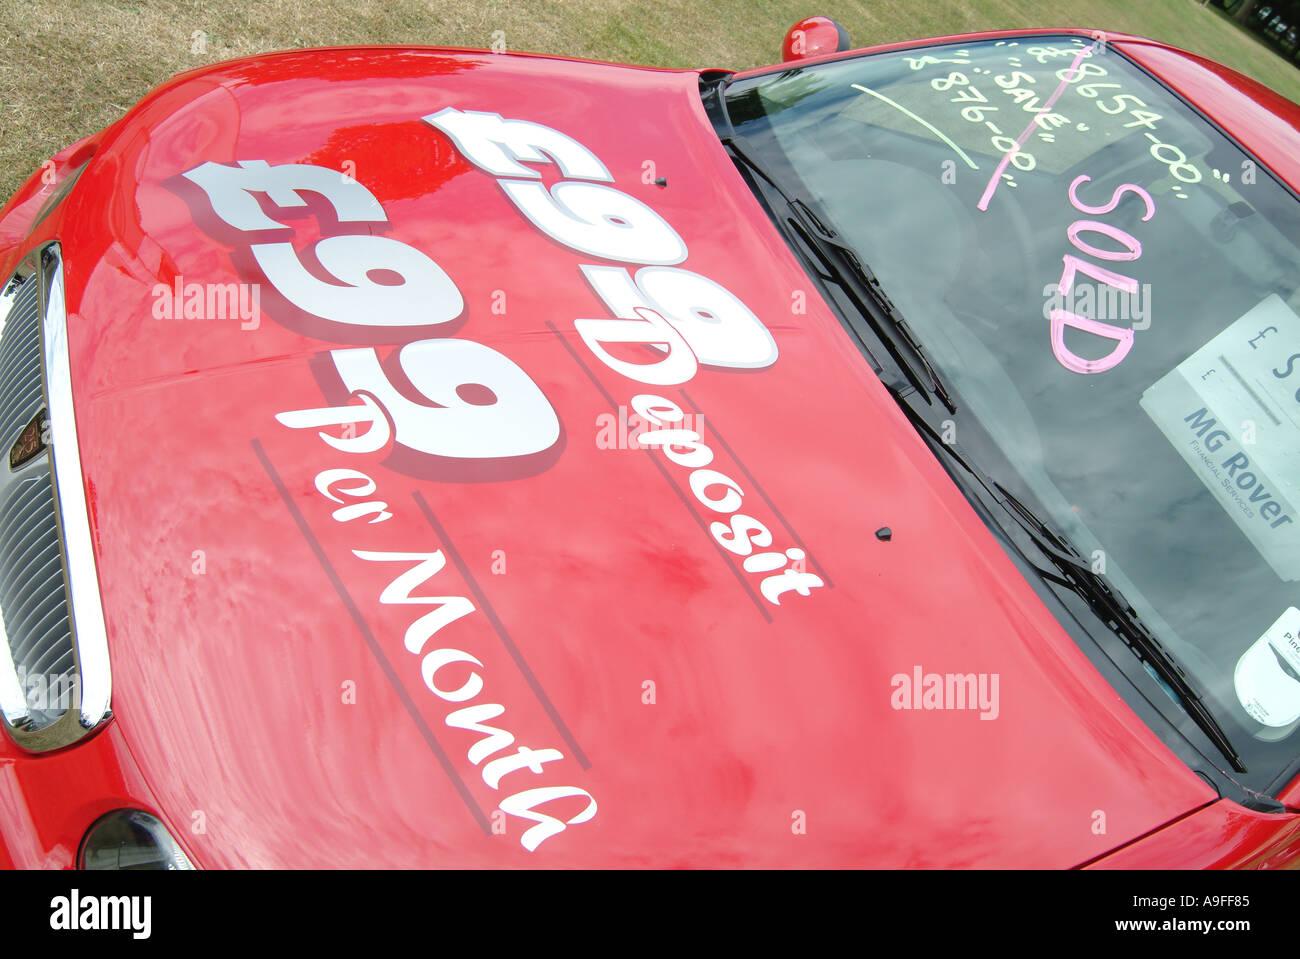 25 rover car maker manufacturer england english GB New car Finance ...